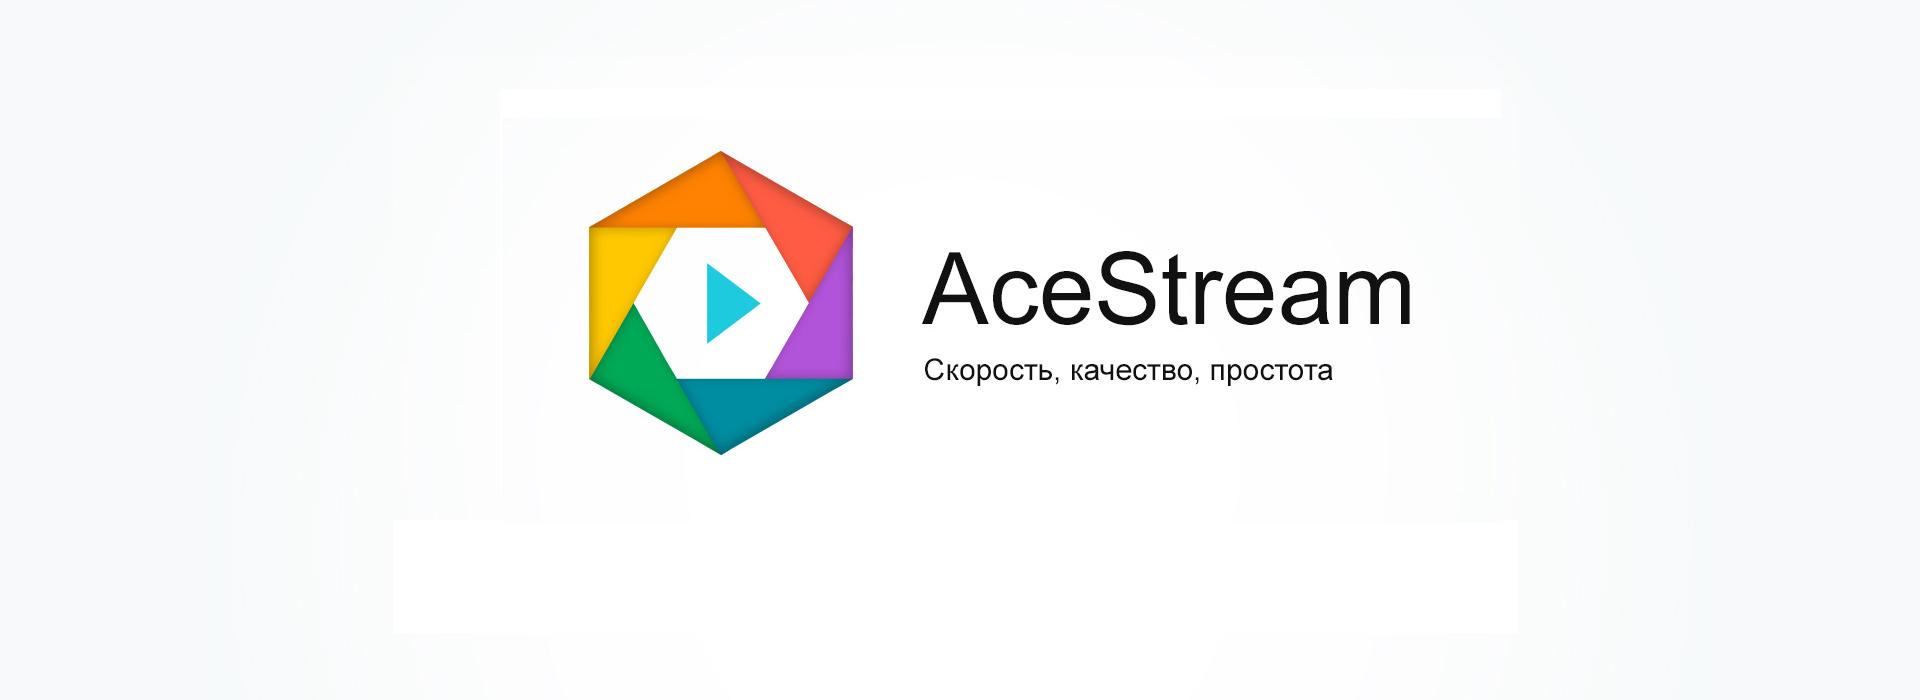 Ace stream apk 4.1.1